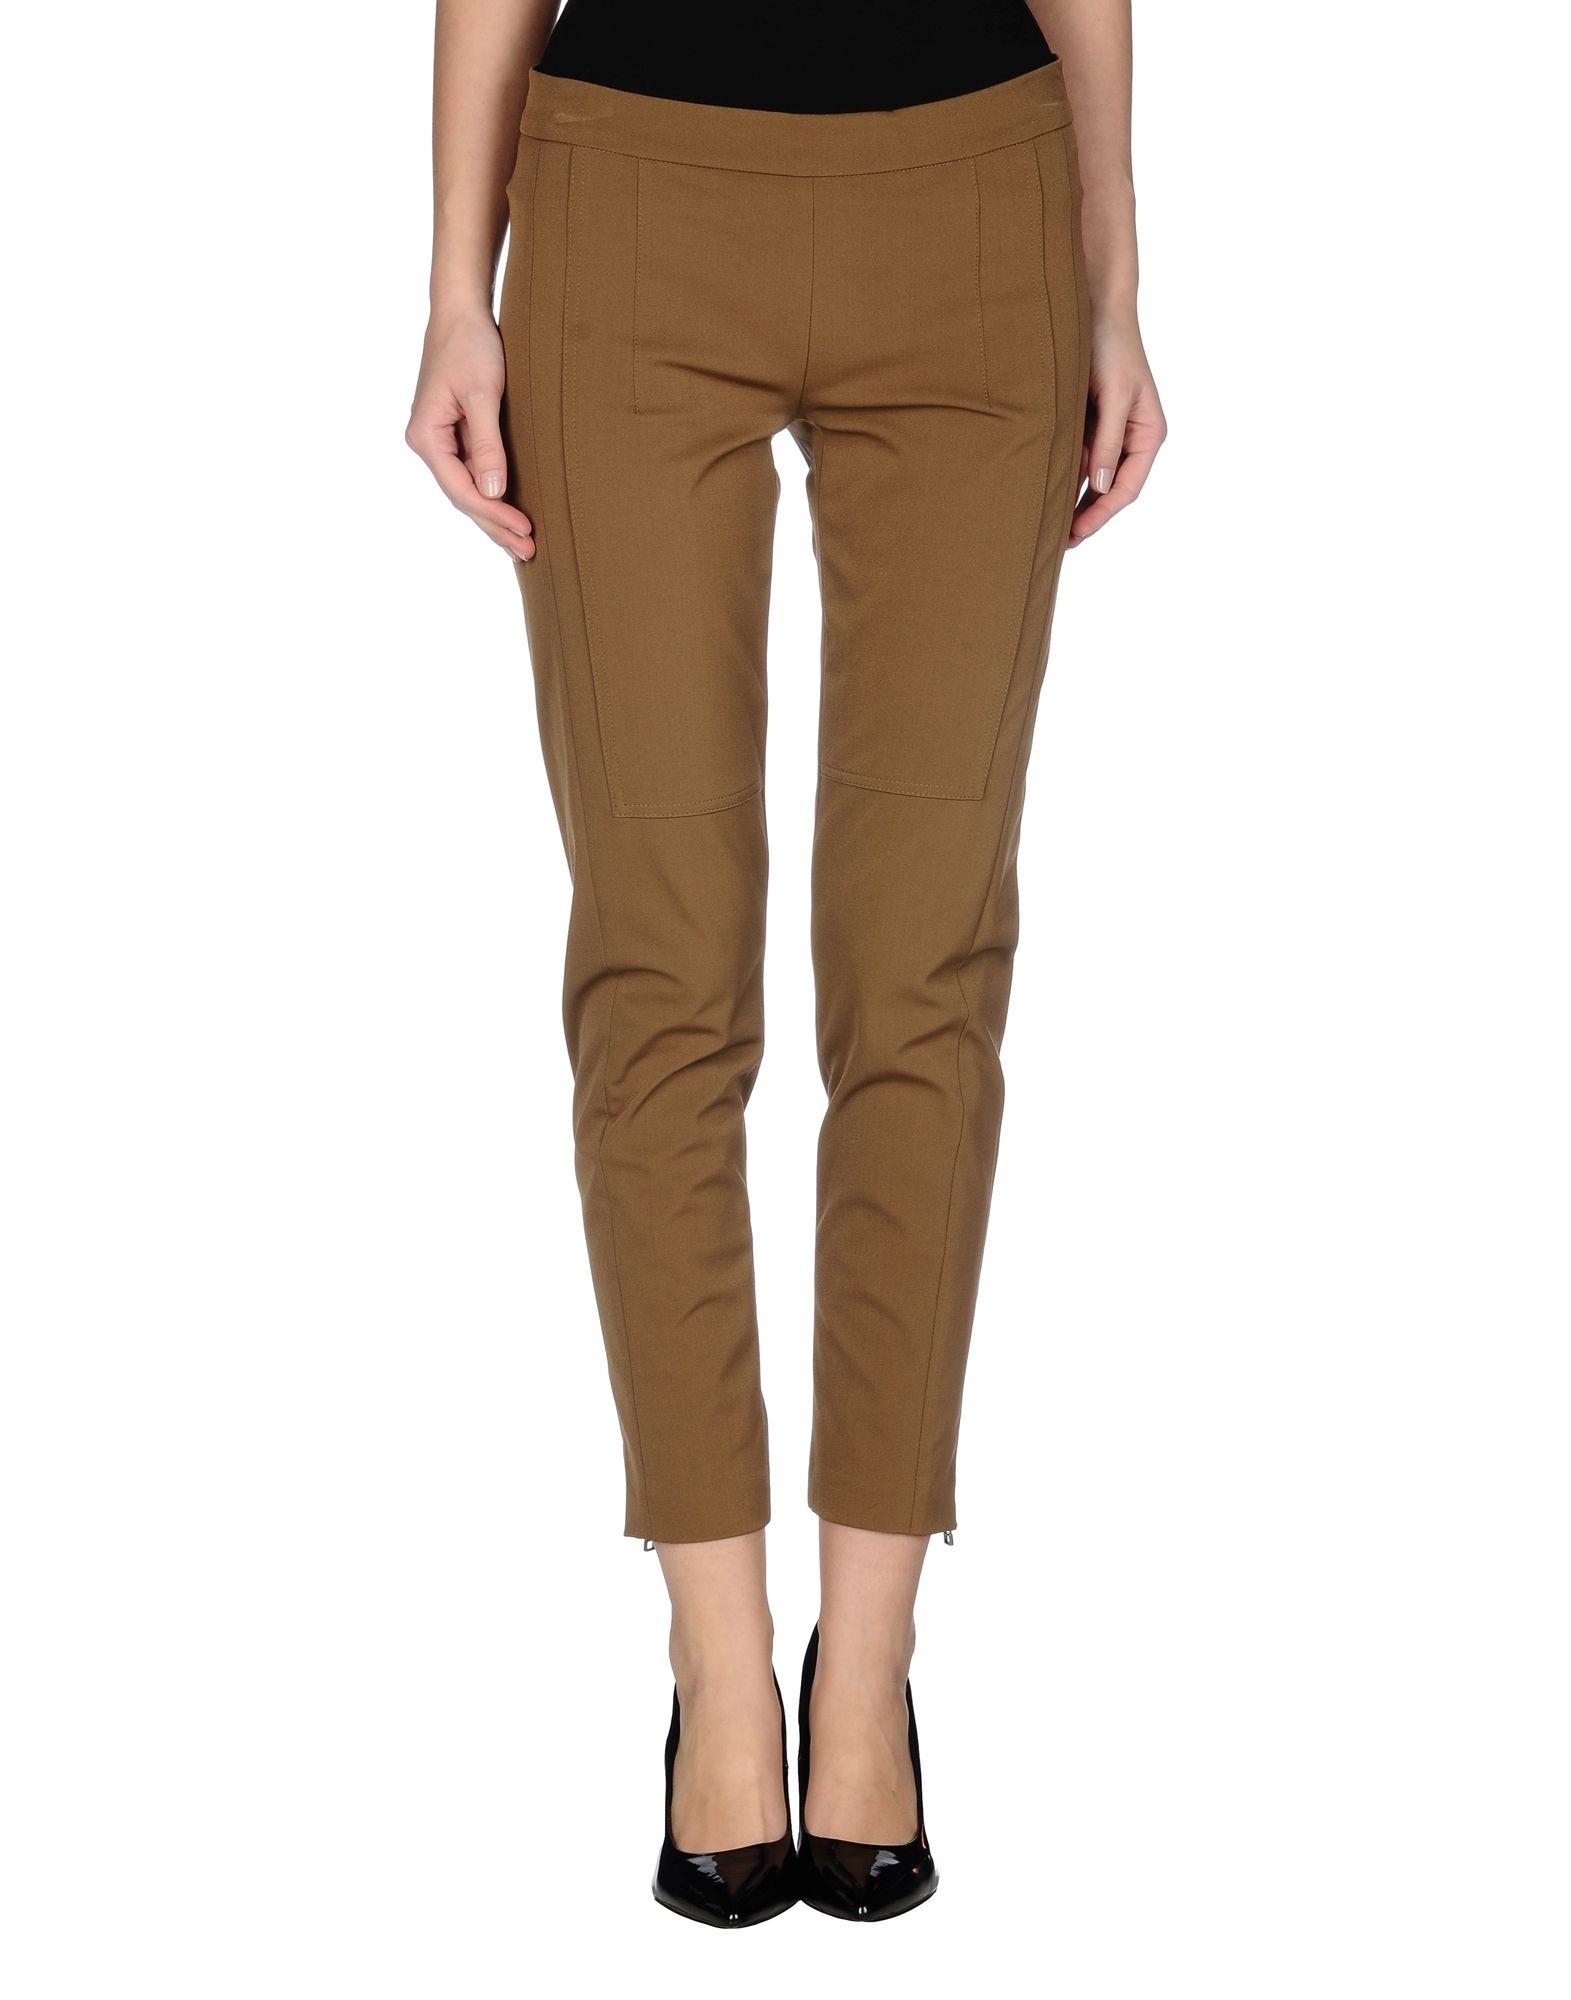 Beautiful Banana Republic Size 4 Khaki Brown Cargo Pants Womens  EBay